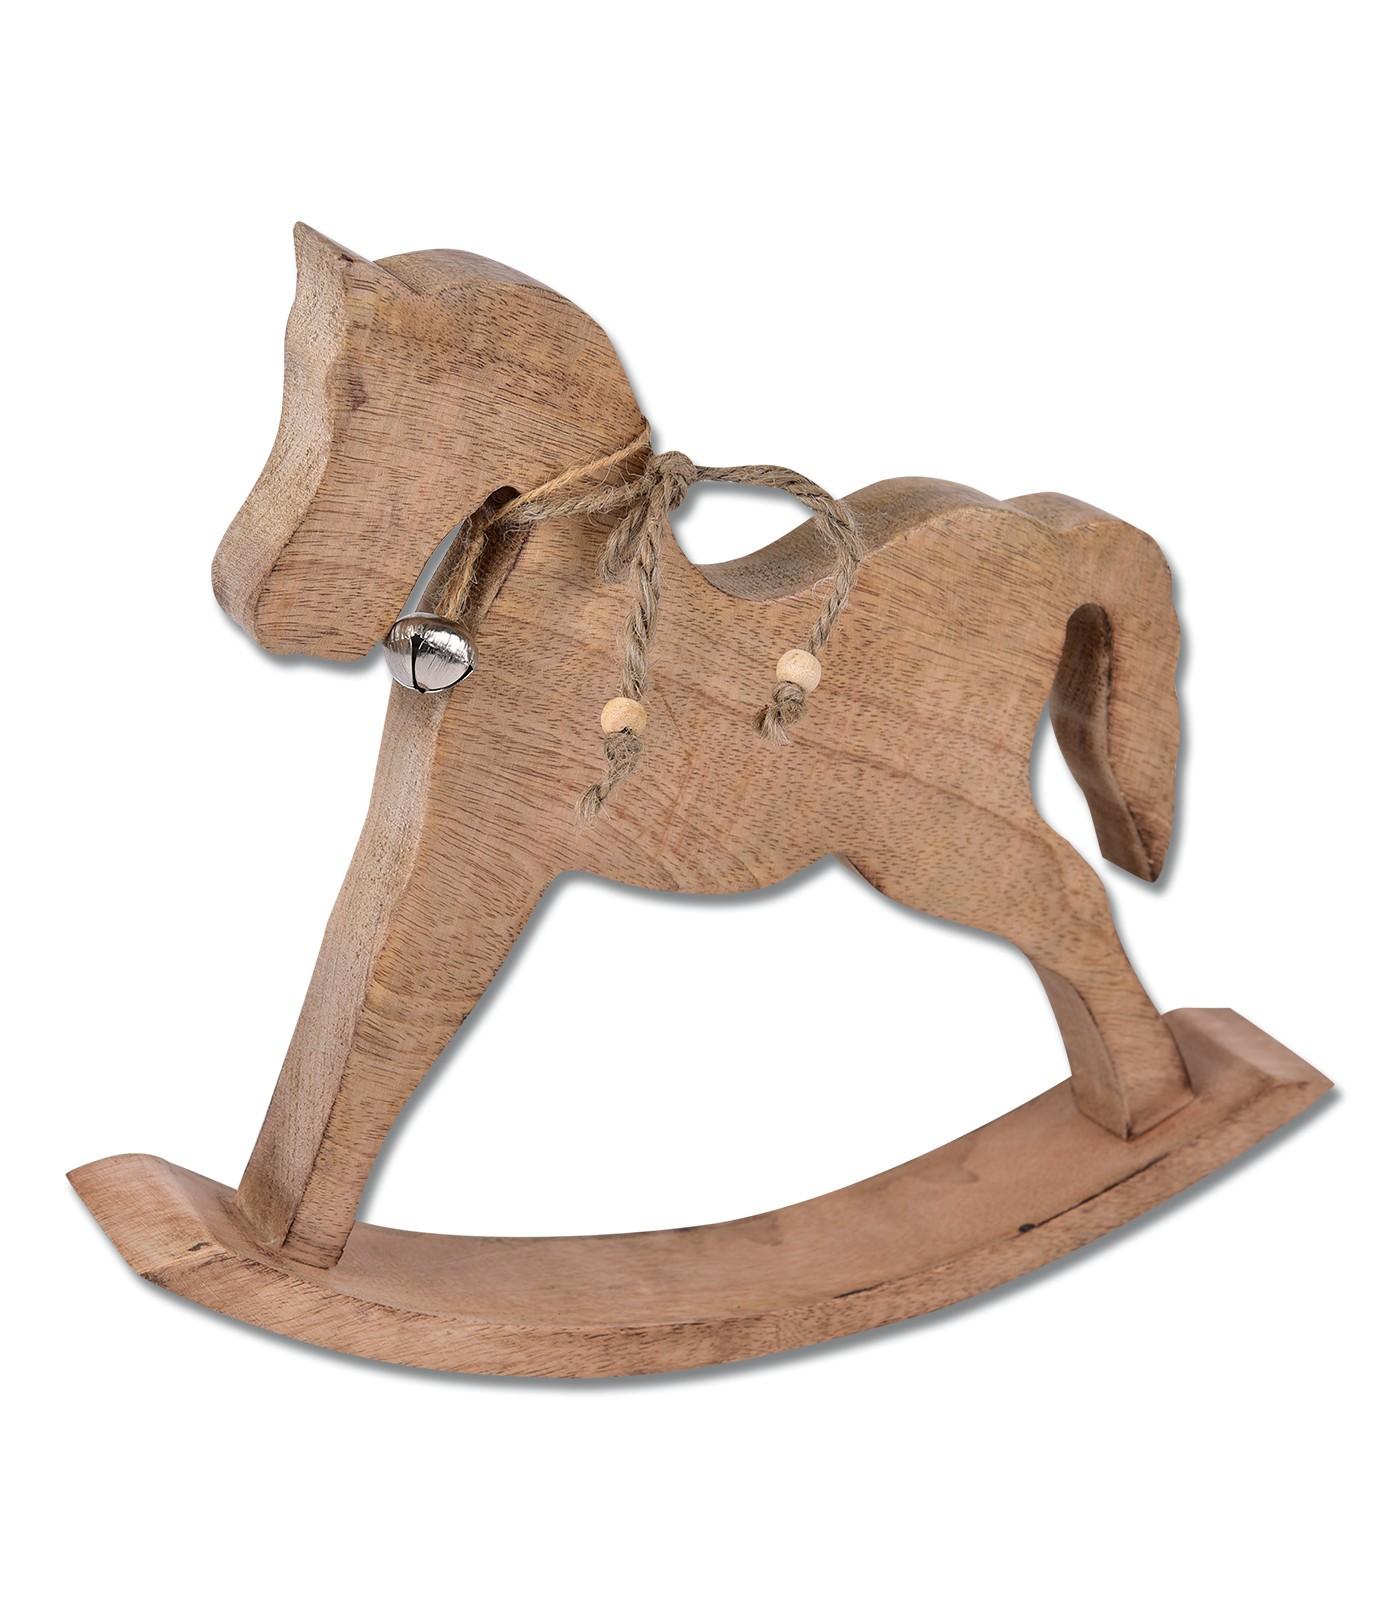 Wooden Rocking Horse Ornament Tack N Ride Westernstore